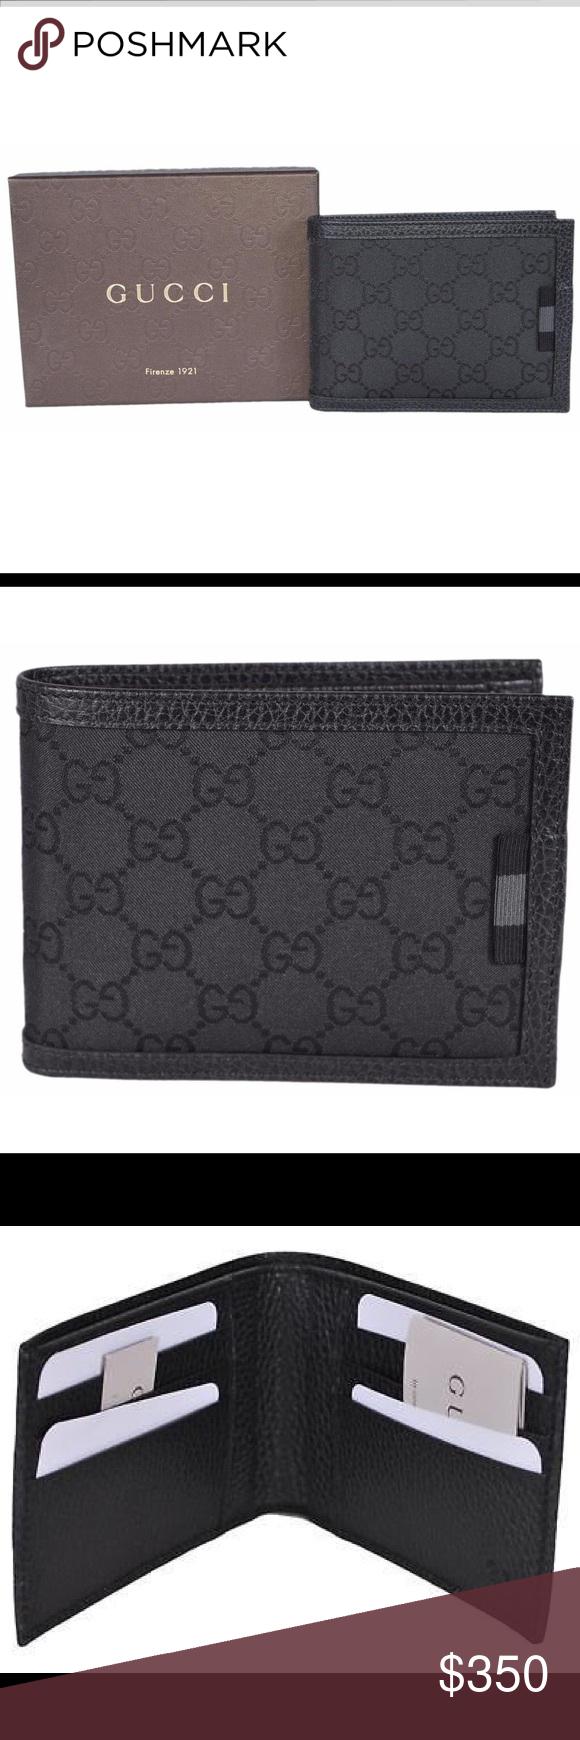 5f39b09d45d Authentic New Gucci men s wallet Authentic New with box. Men s Gucci  guccissima bifold wallet. Leather canvas Gucci Accessories Money Clips